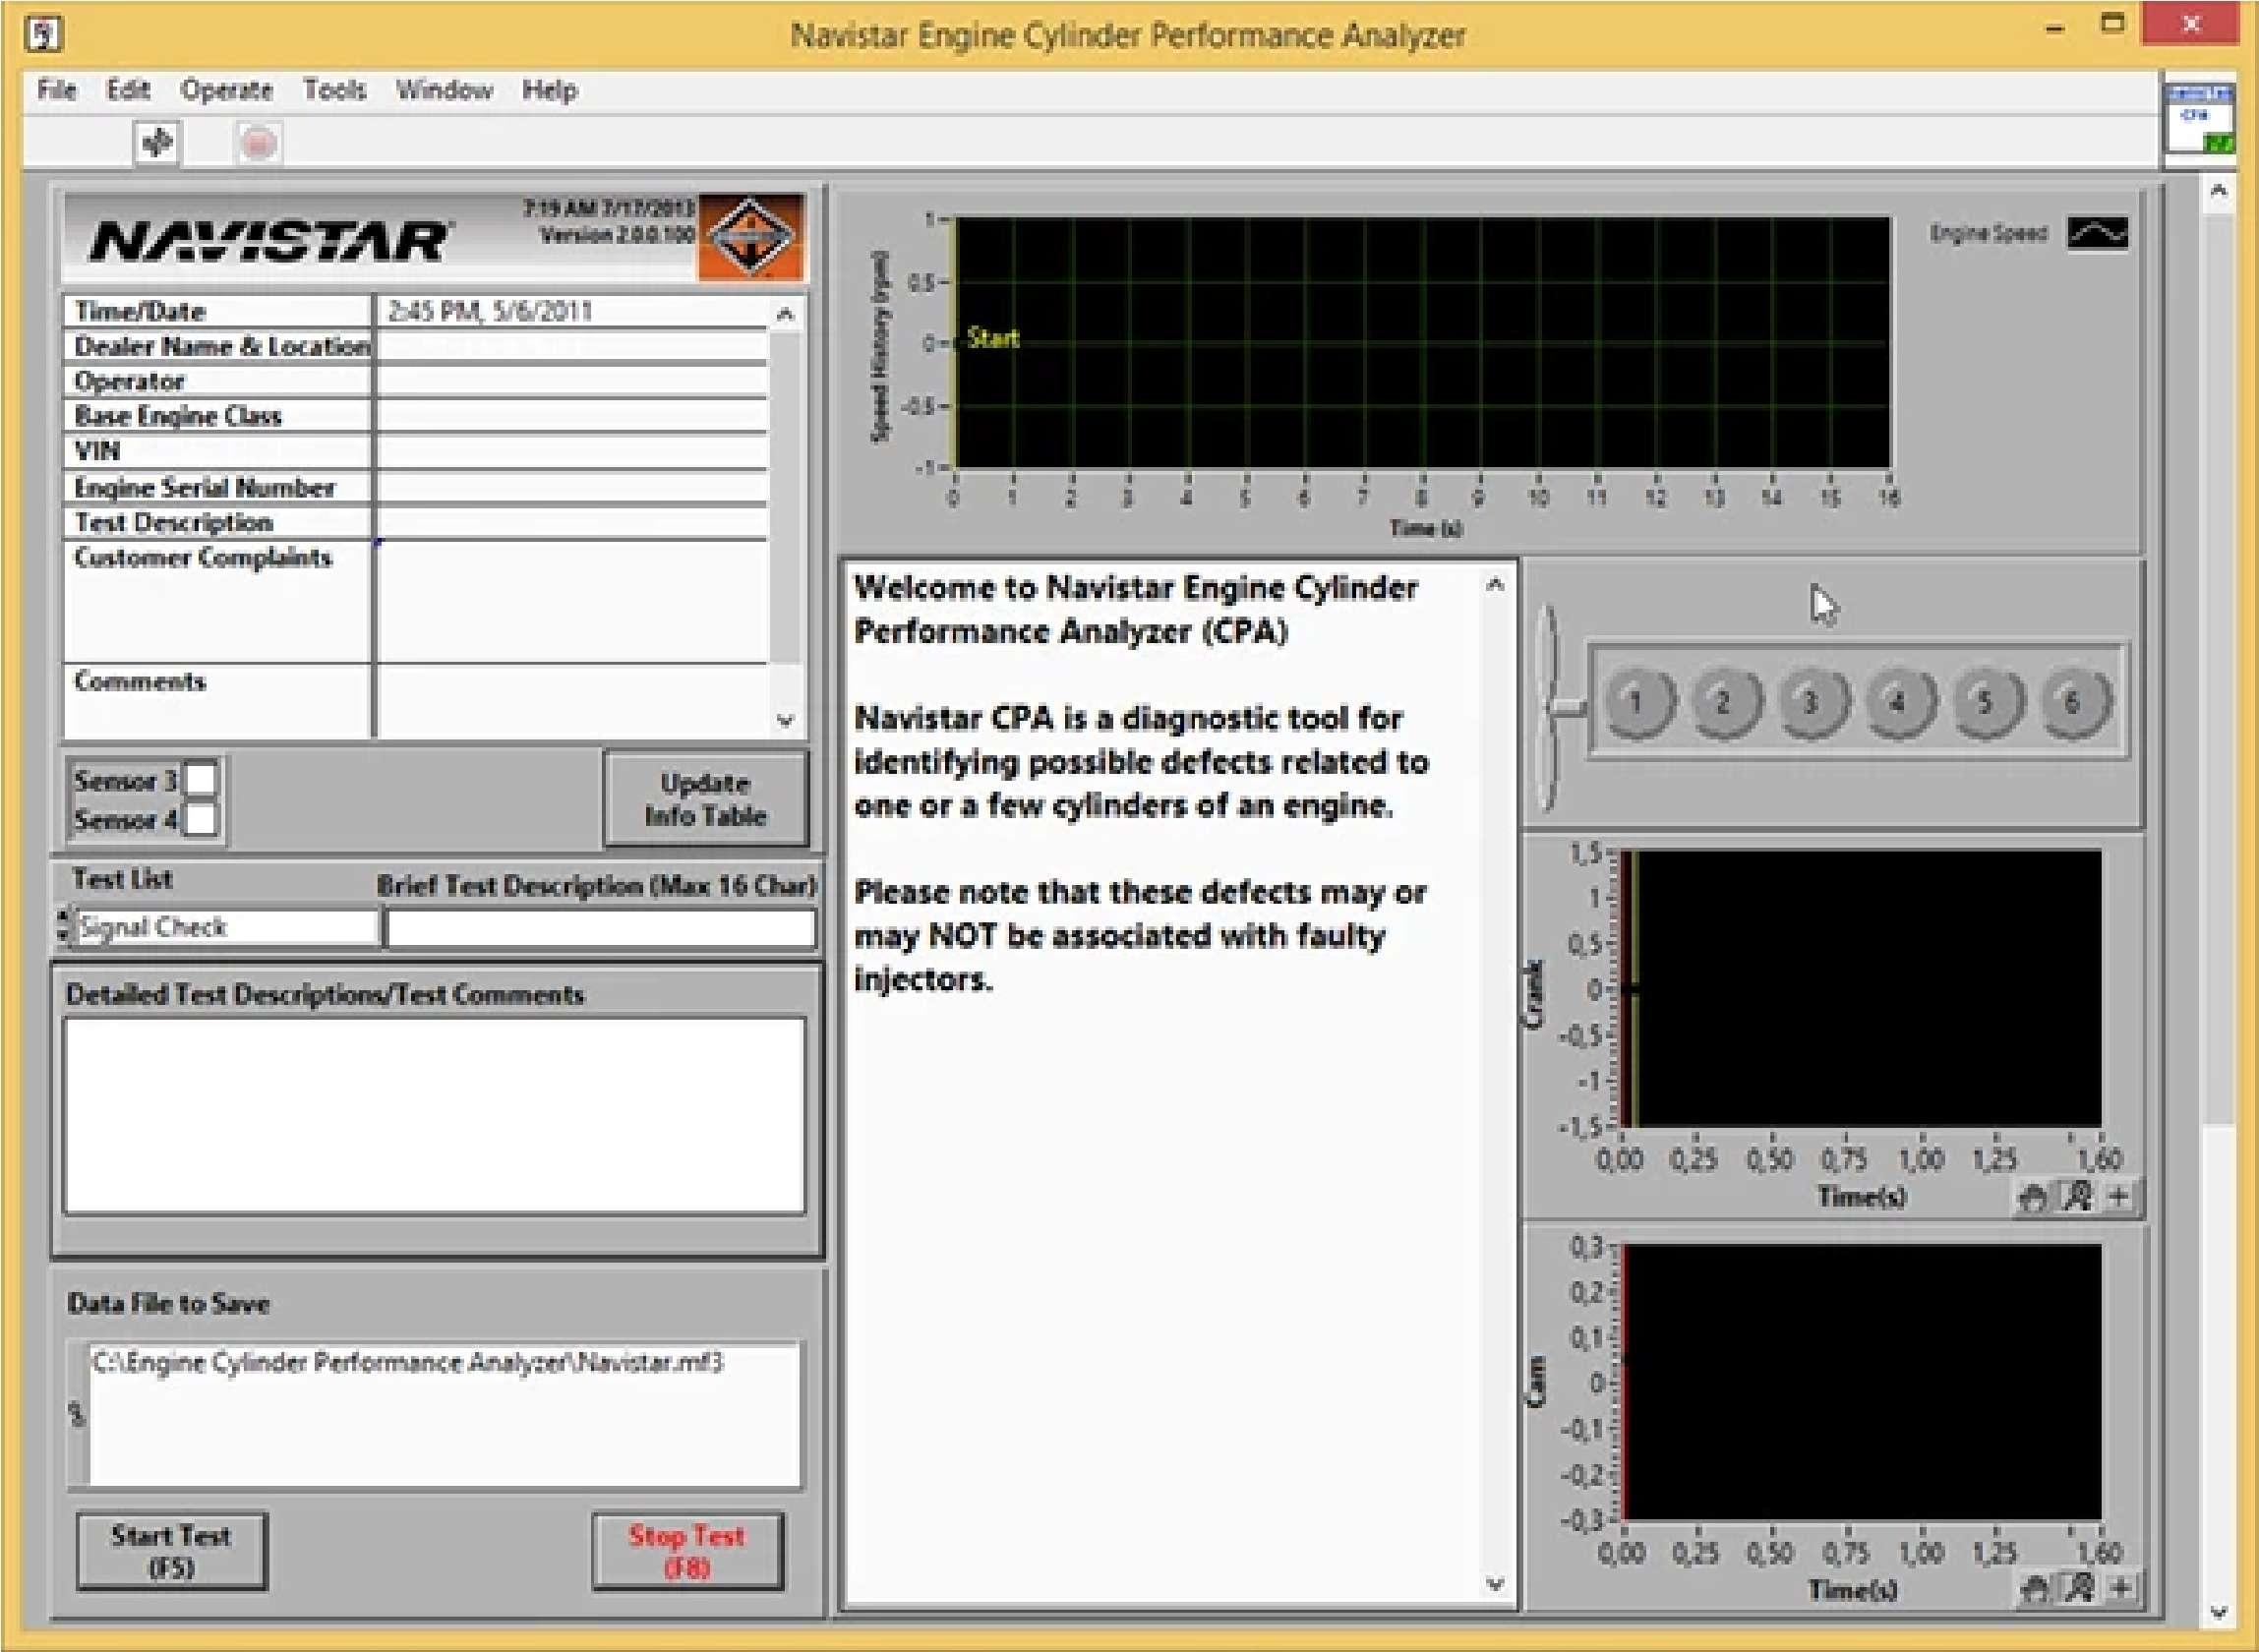 Navistar Engine Cylinder Performance Analyzer (CPA) SS-01